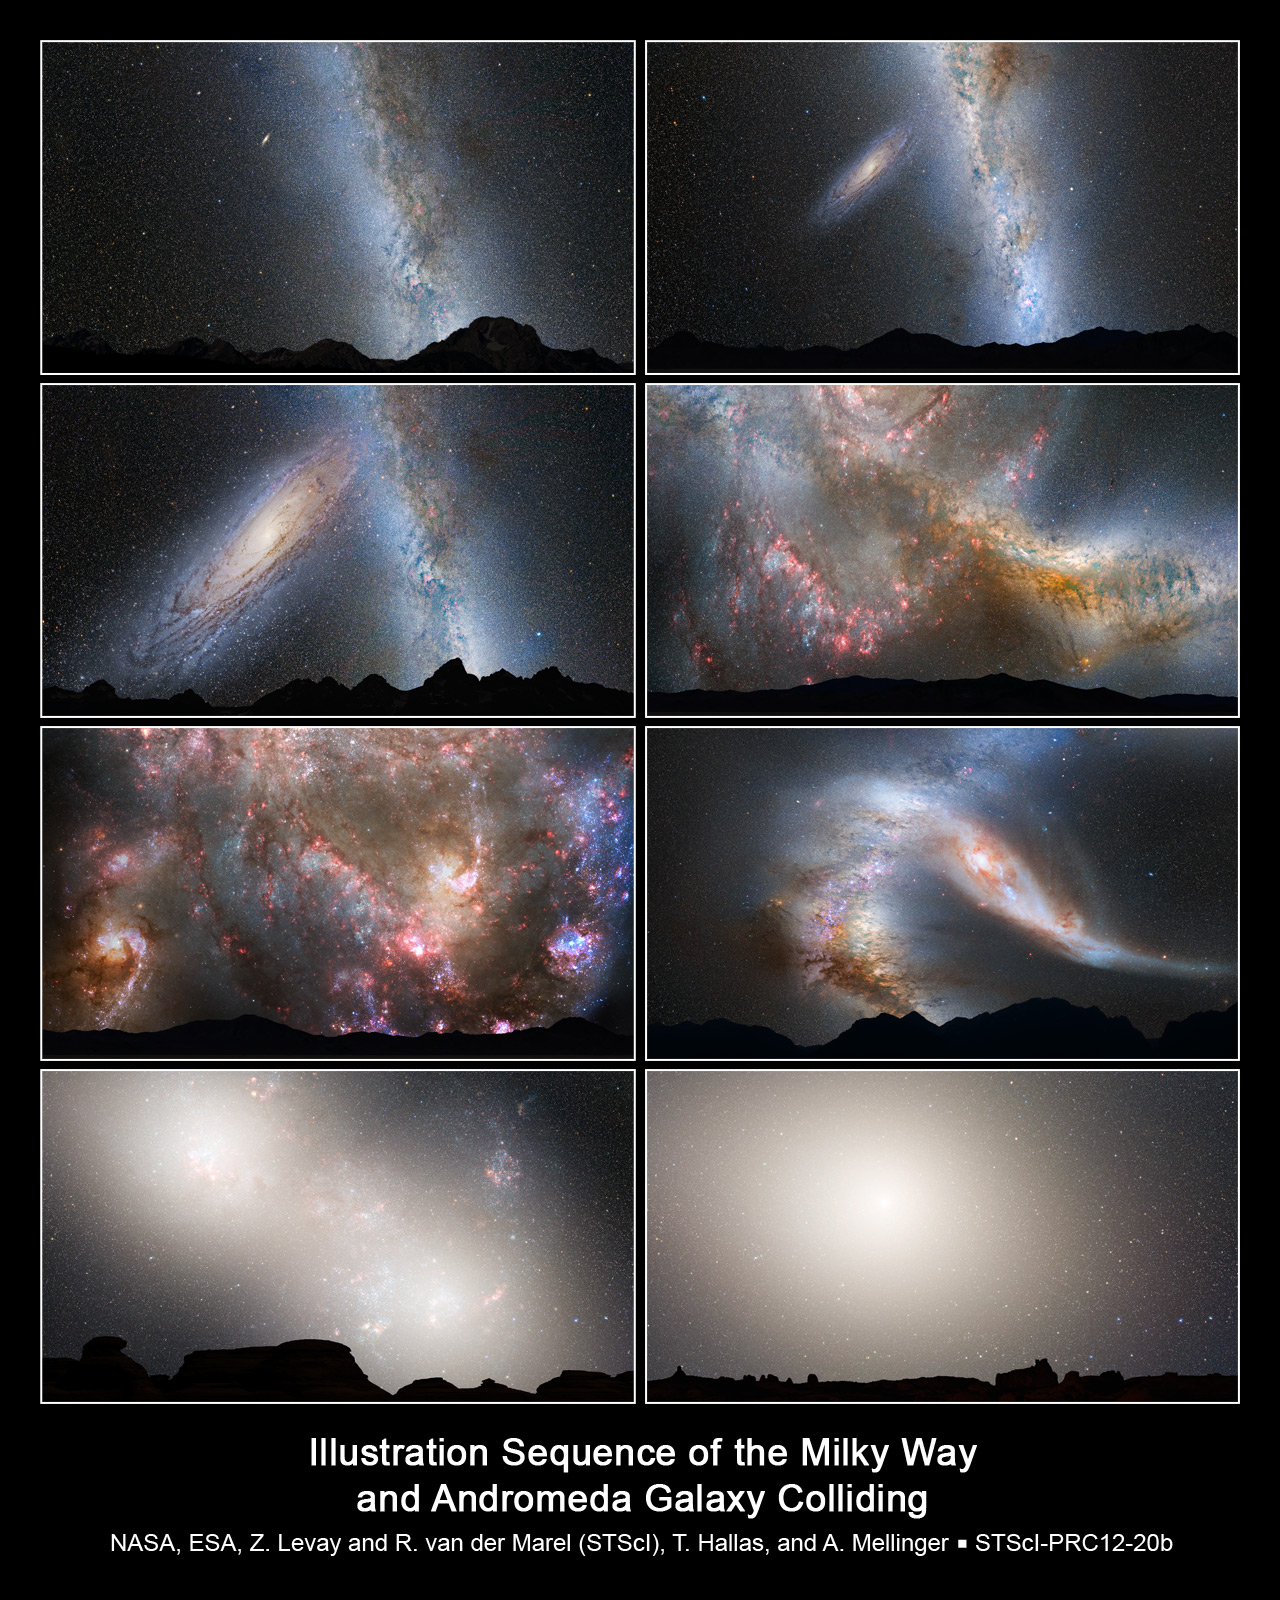 Merger between the Milky Way galaxy and Andromeda galaxy